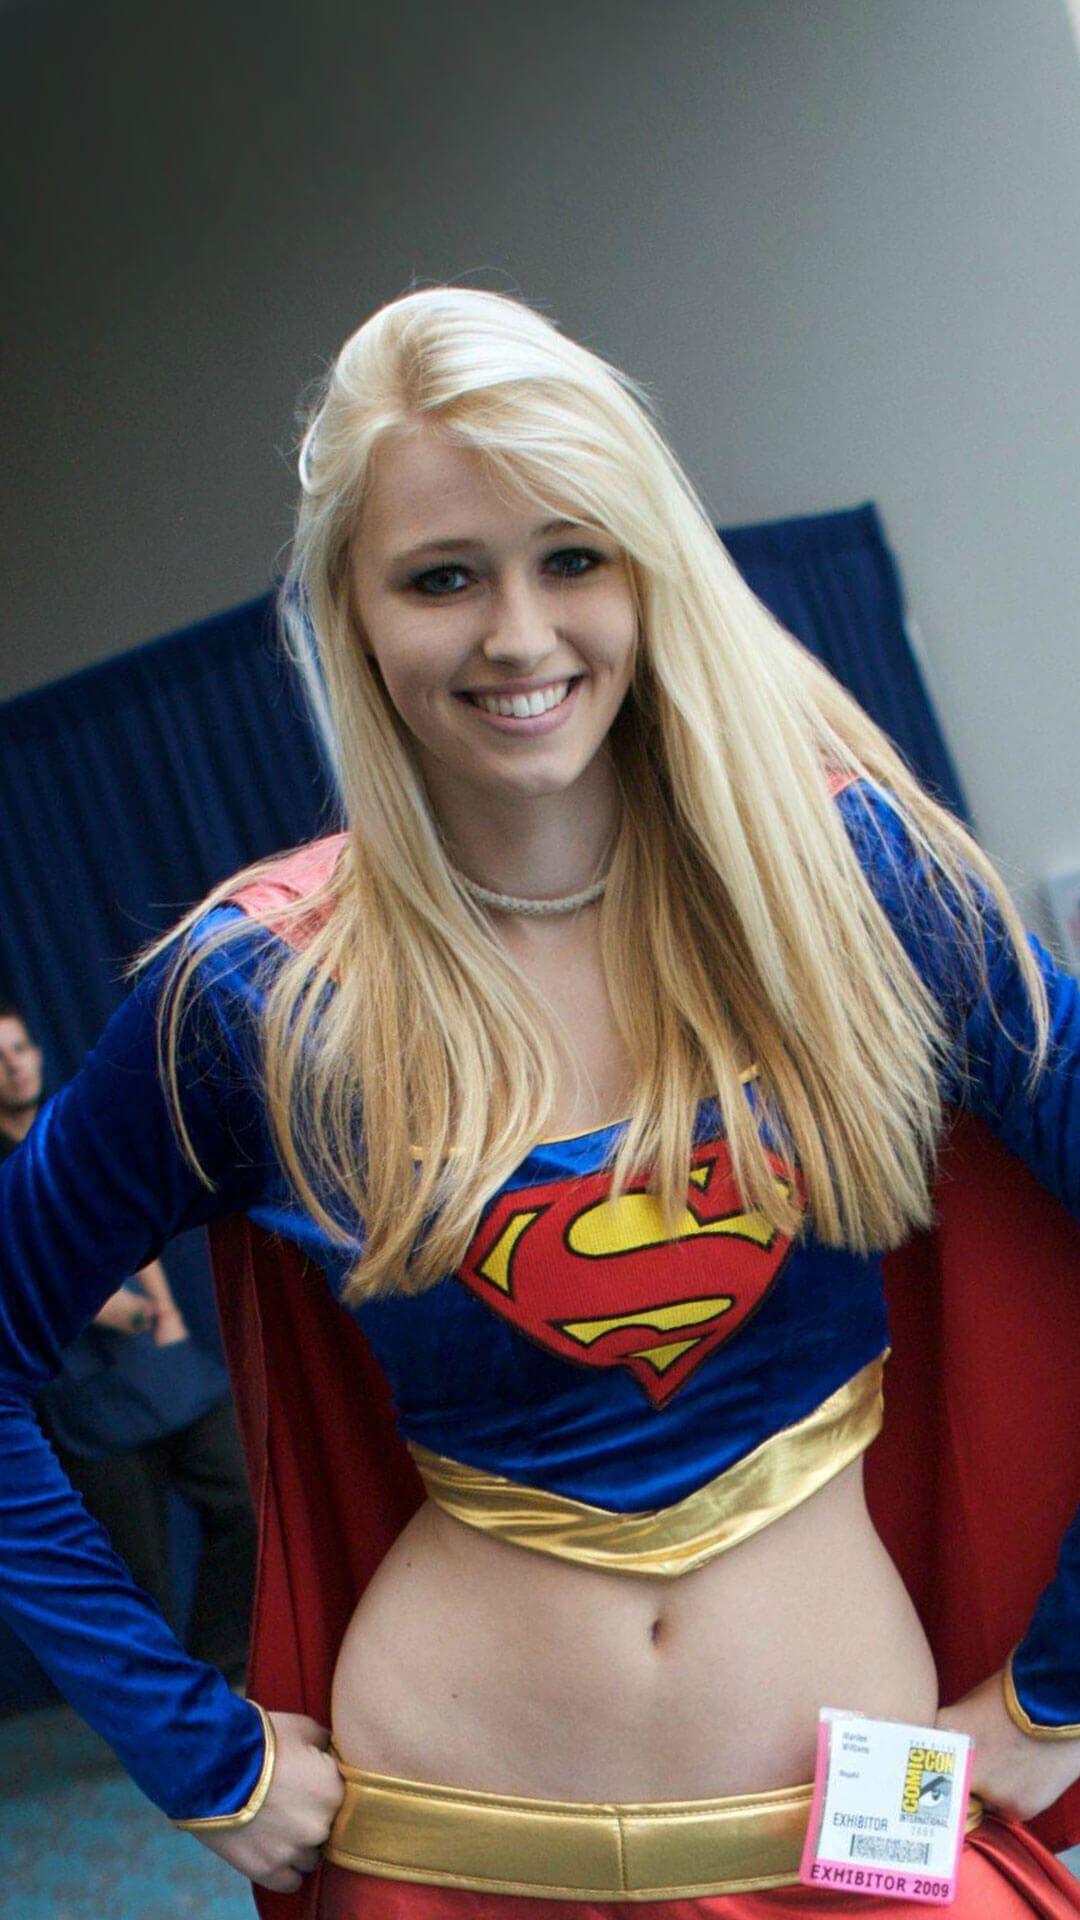 Supergirl Wallpaper iPhone 6 HD Supergirl, Iphone